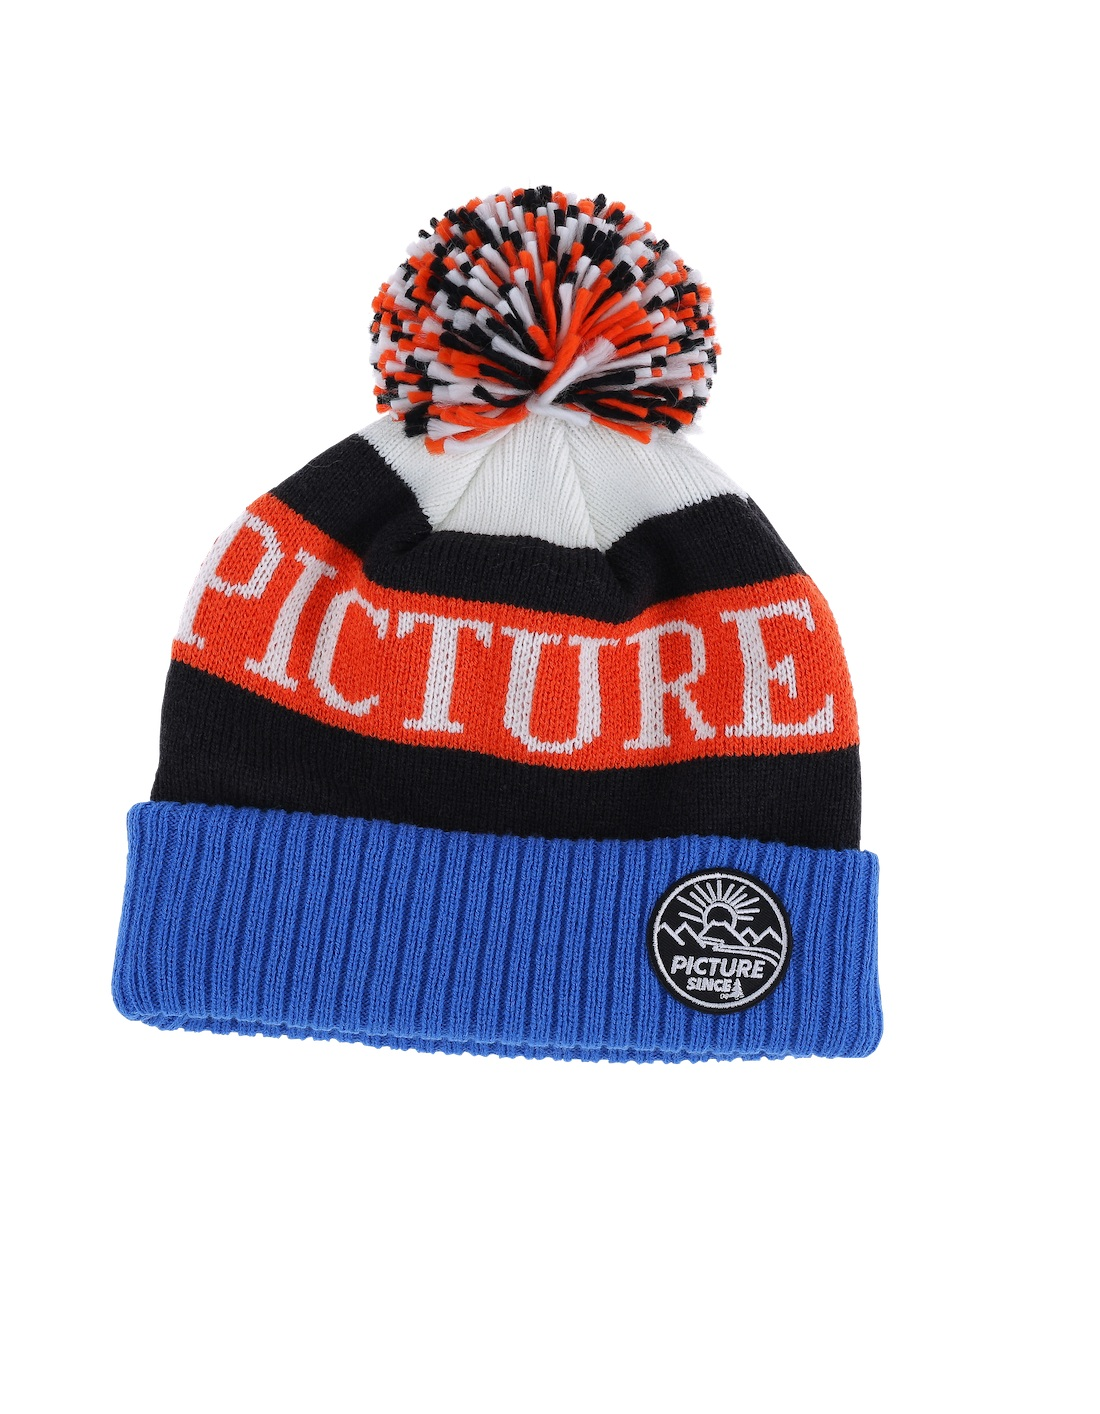 Купить Шапка Picture Organic 2016-17 IGOR B White/Black/Orange Головные уборы, шарфы 1306662